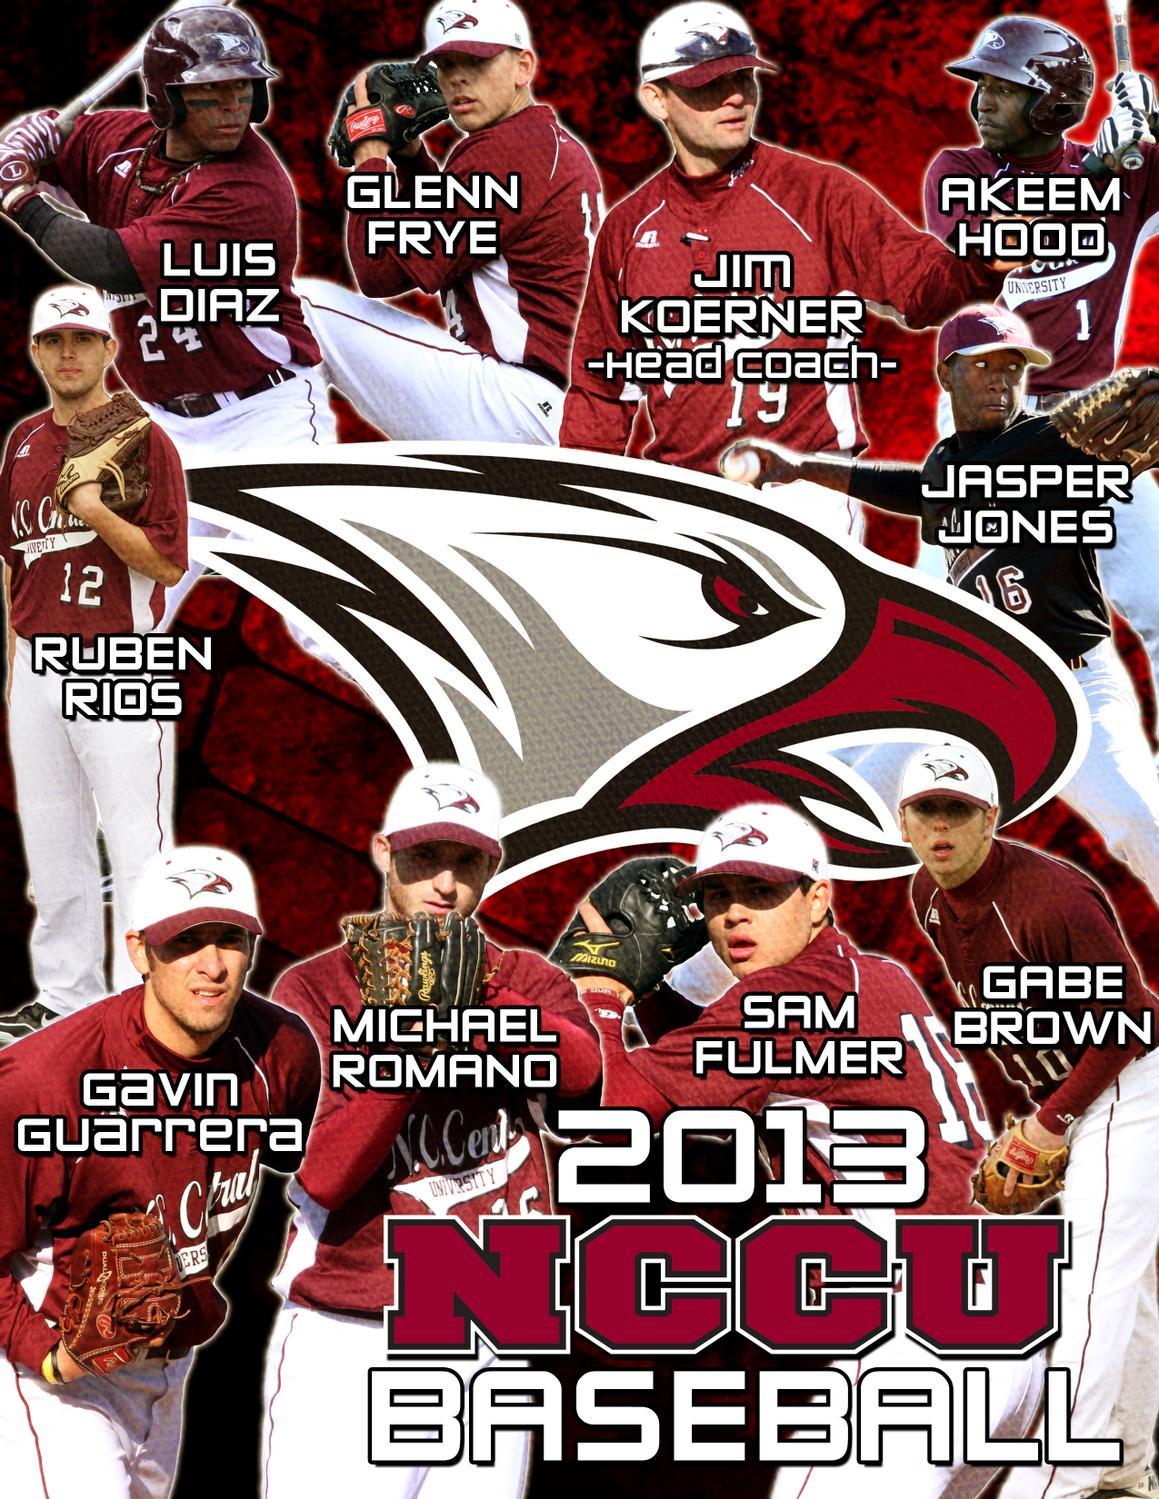 2013 nccu baseball information guide by north carolina central